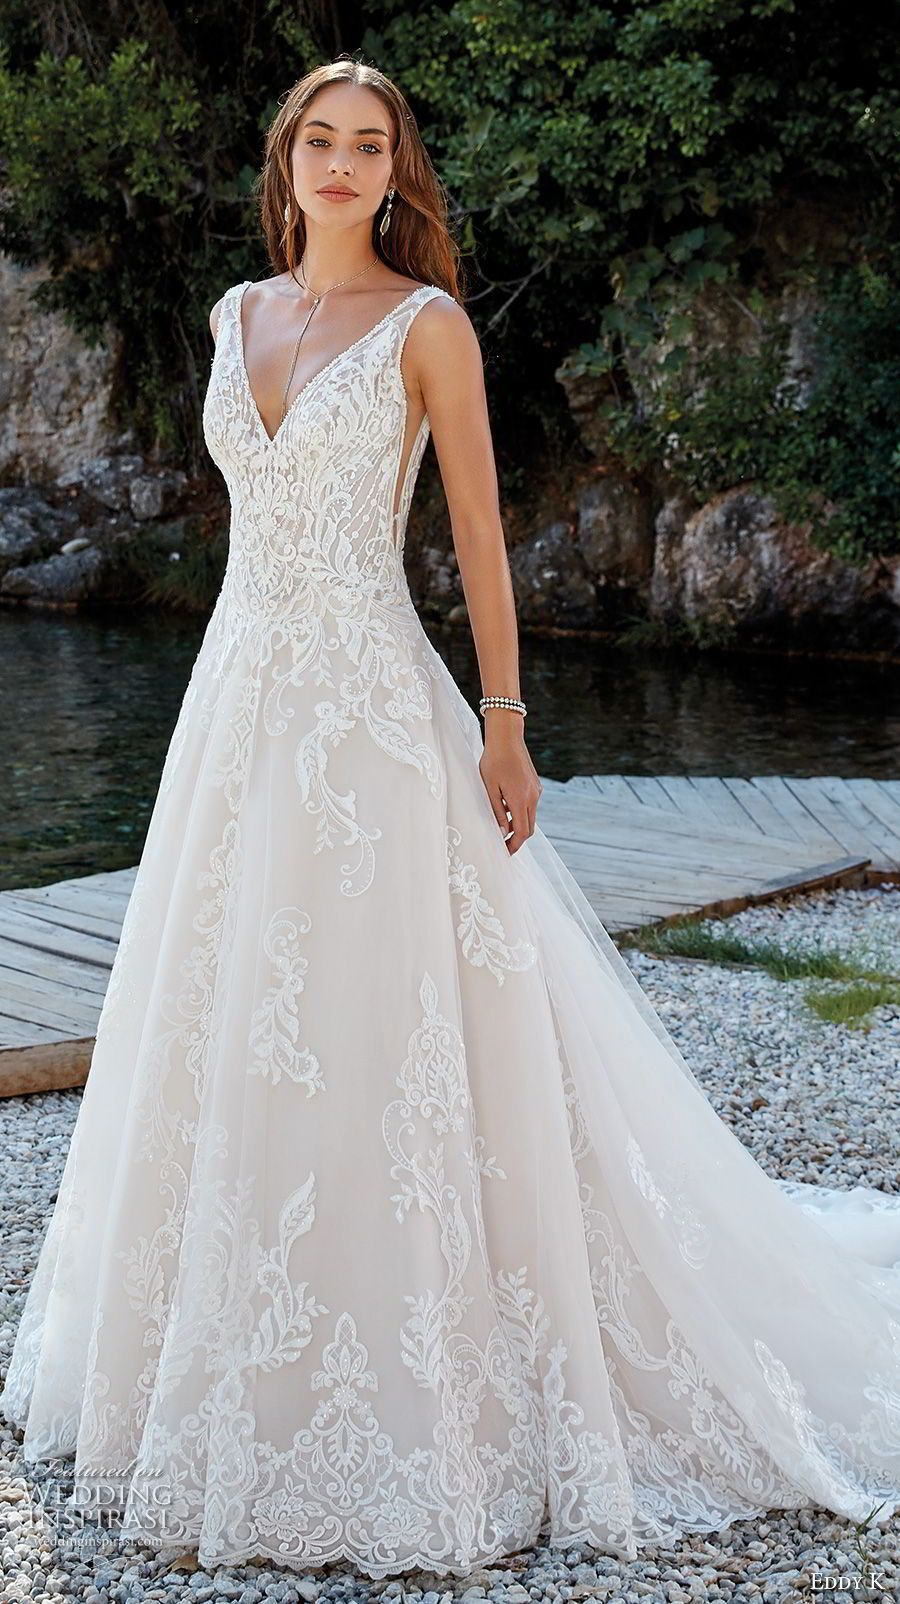 Eddy k dreams 2019 wedding dresses vg pinterest A line wedding dress 2019